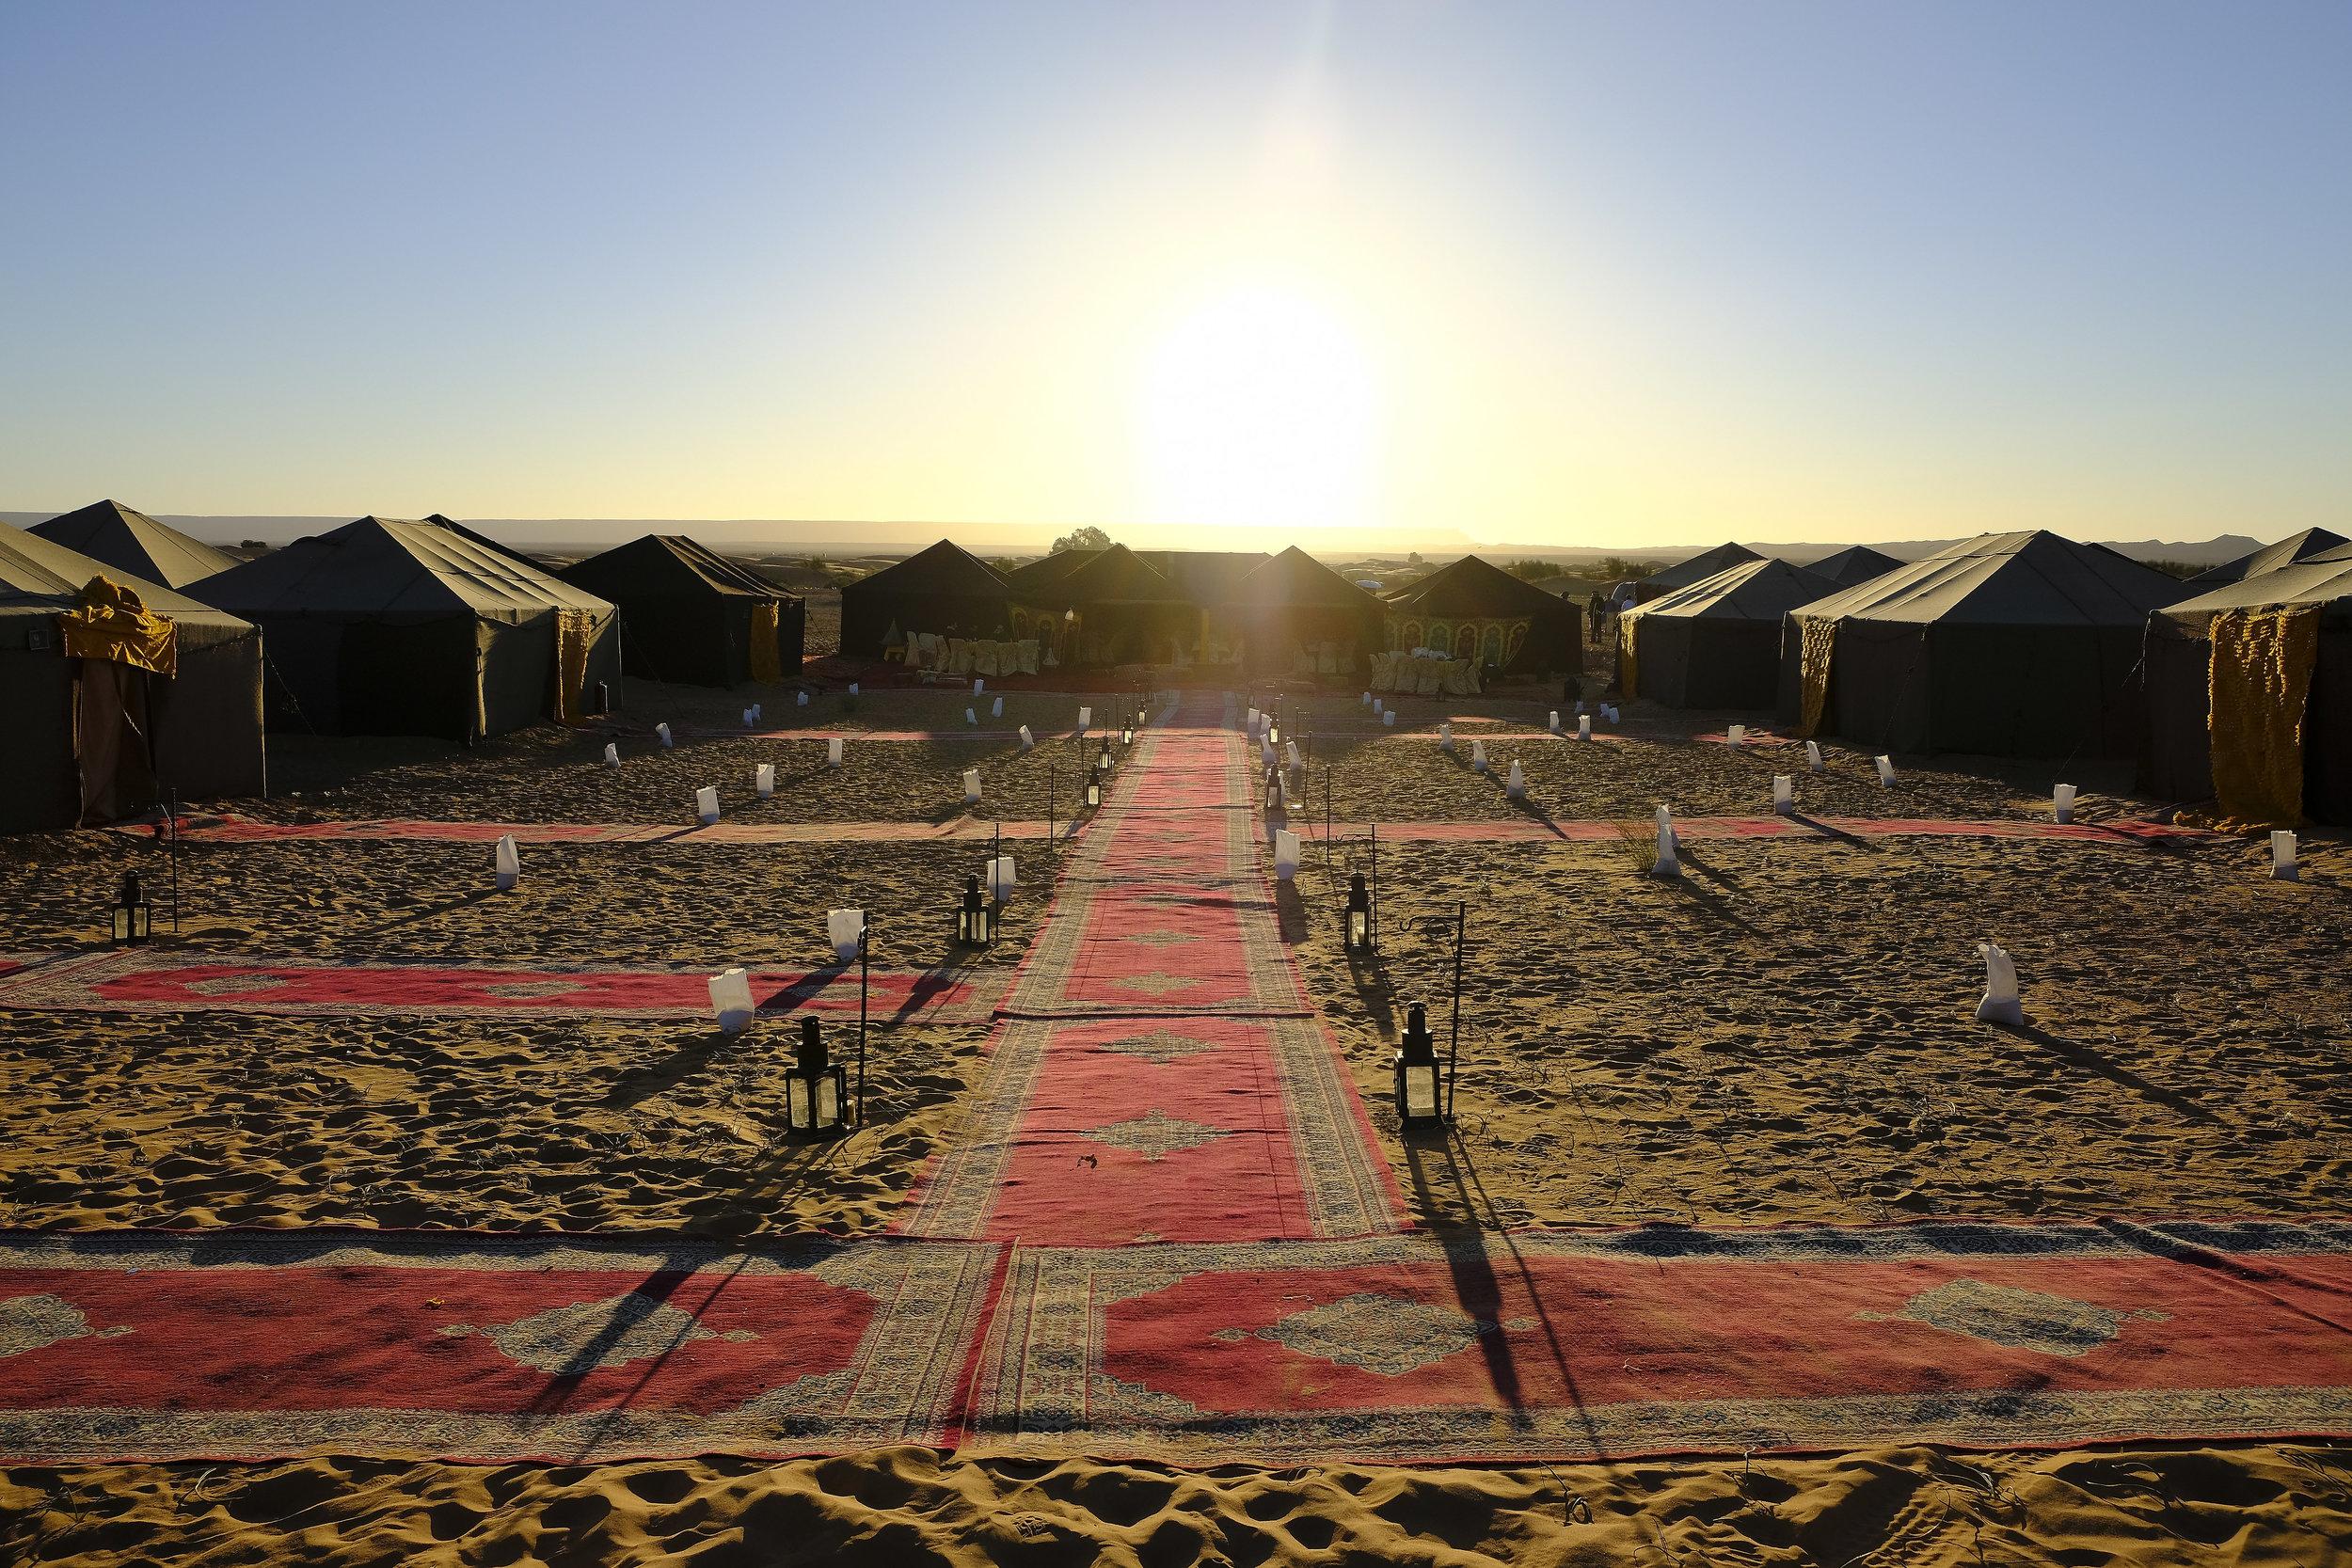 Desert camp in Gallops of Morocco 2018